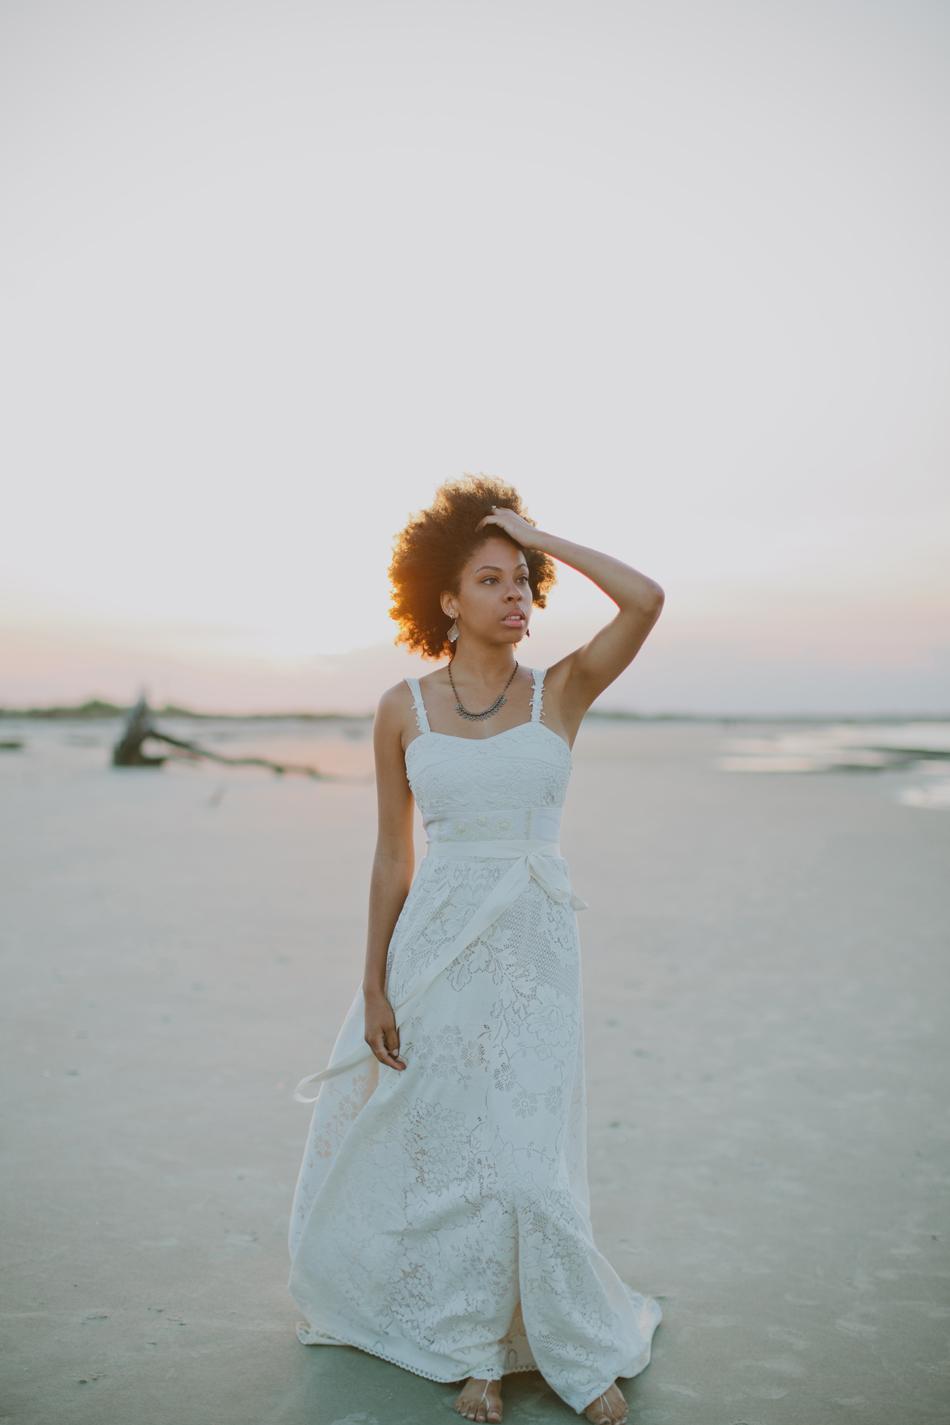 Jameykay_arlie_bohemian_elopement_styled_shoot077.jpg